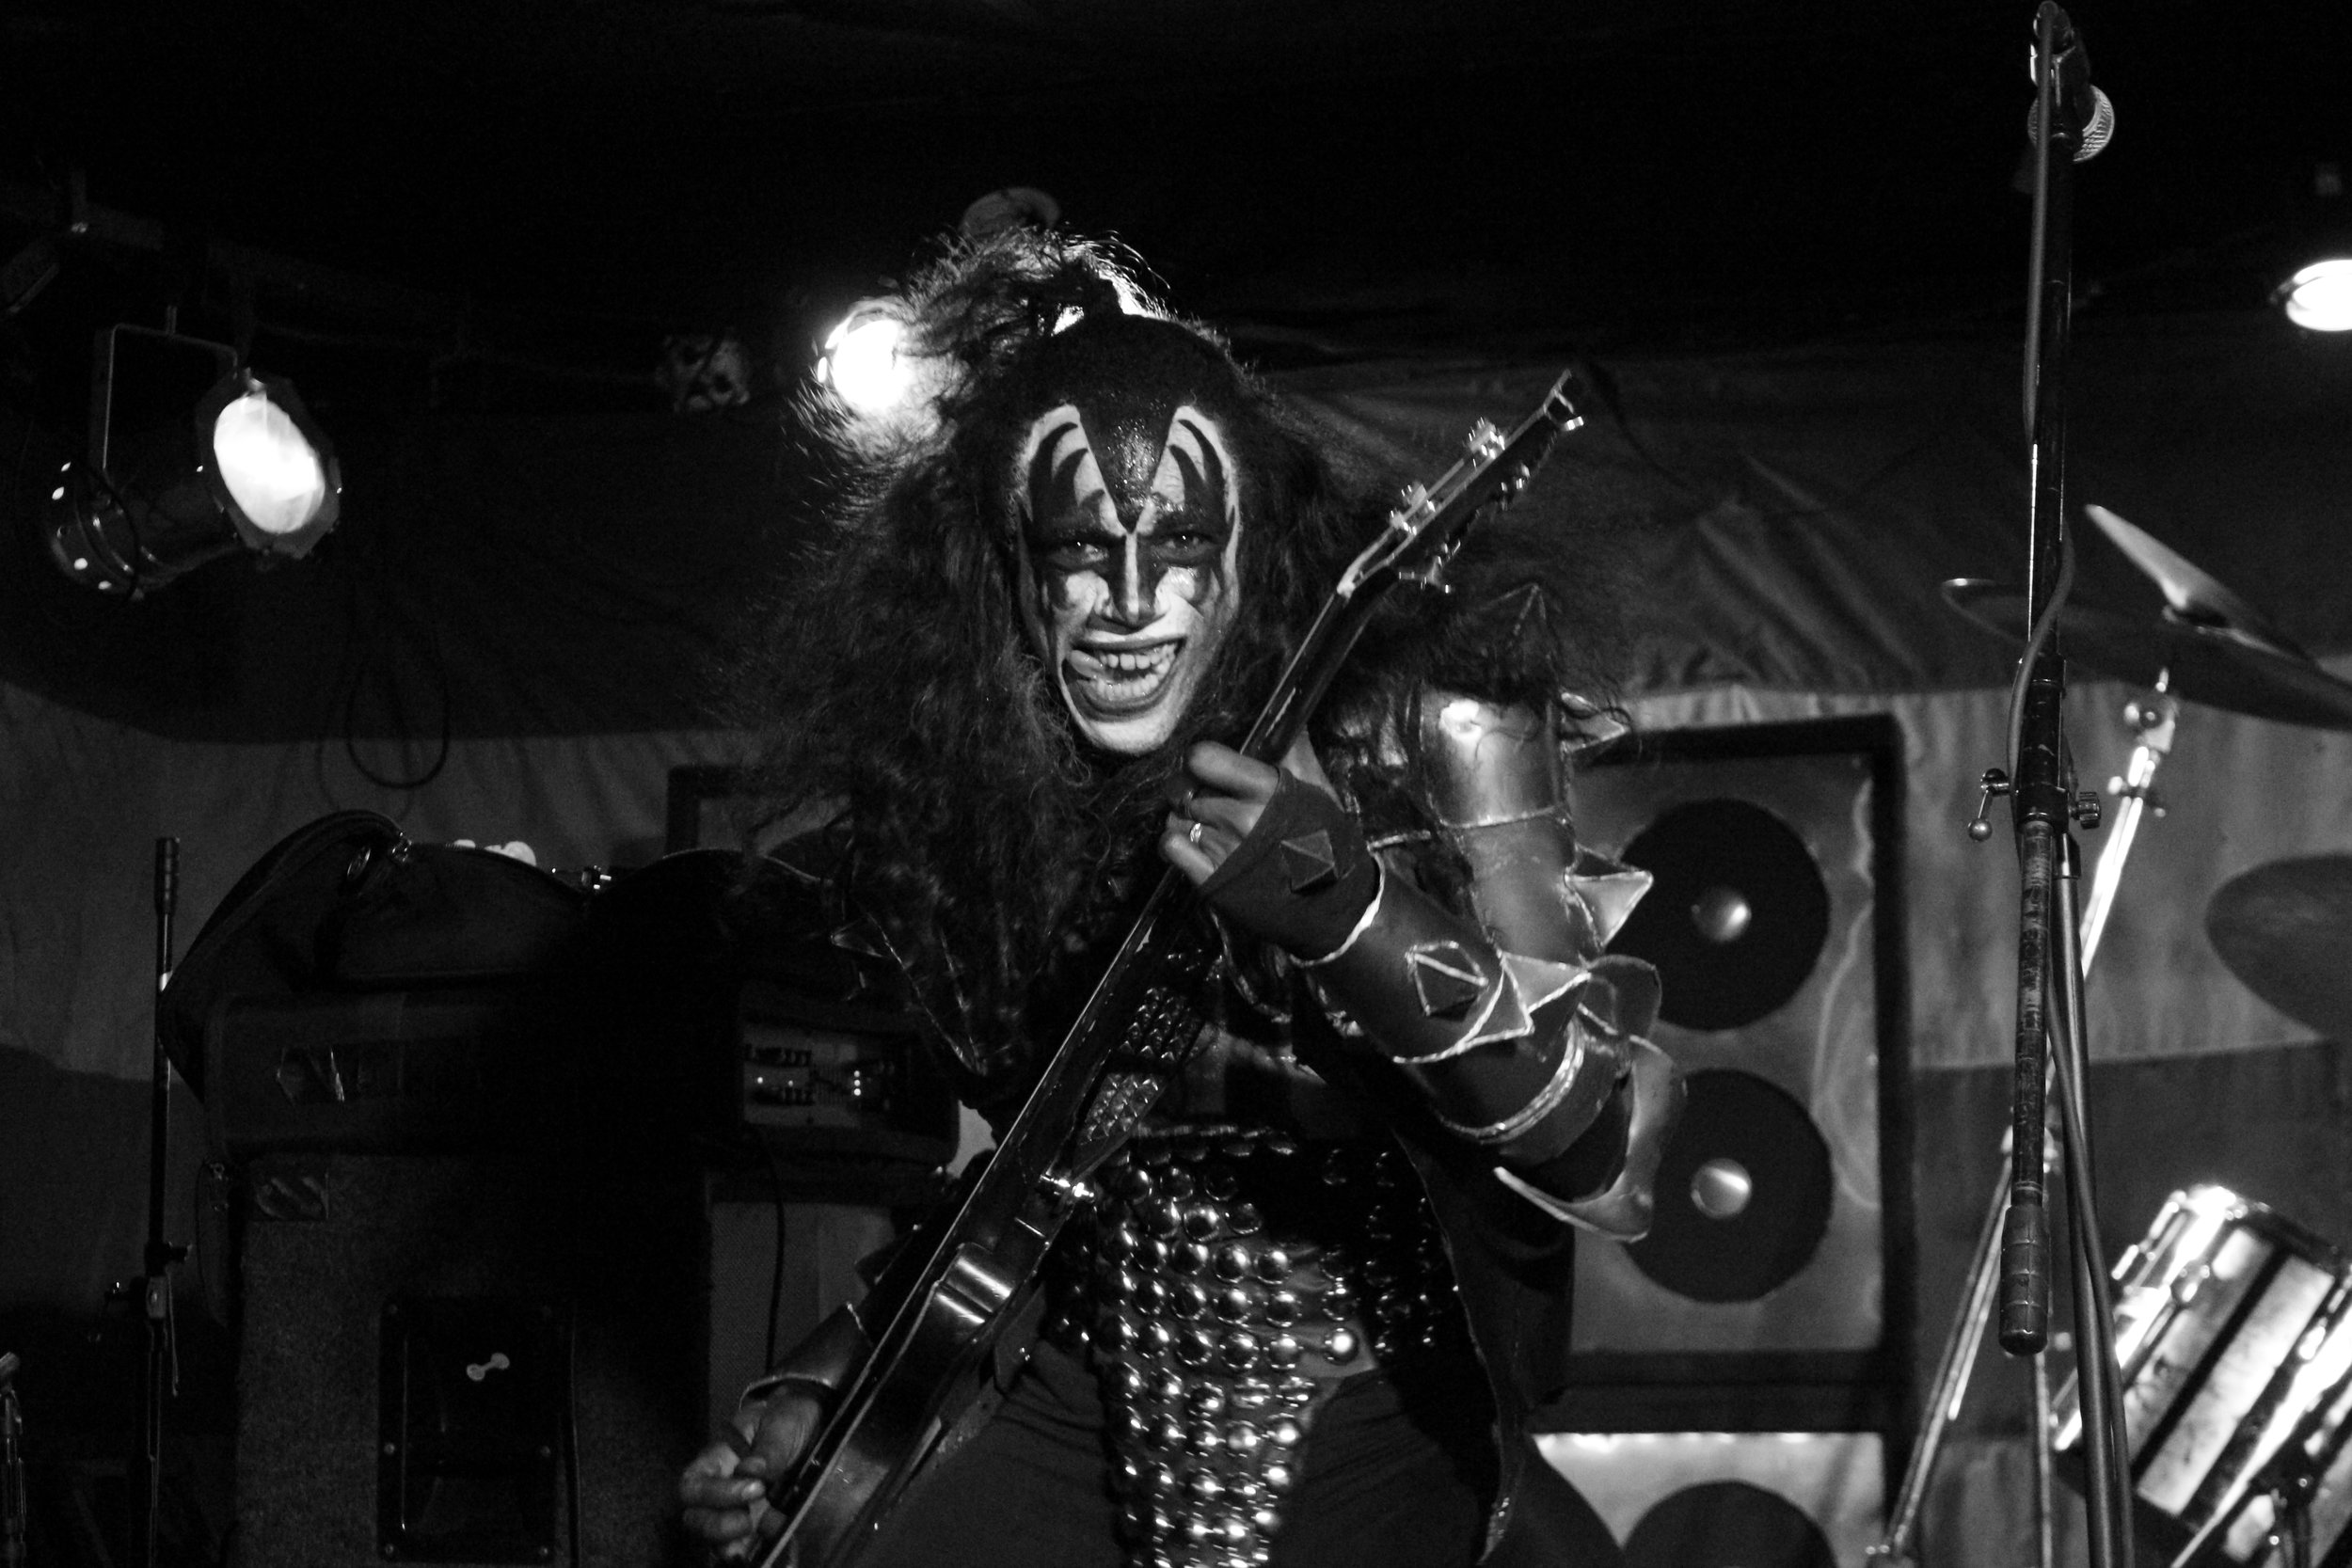 KISS Army. The Nick, Birmingham, AL. 2014.